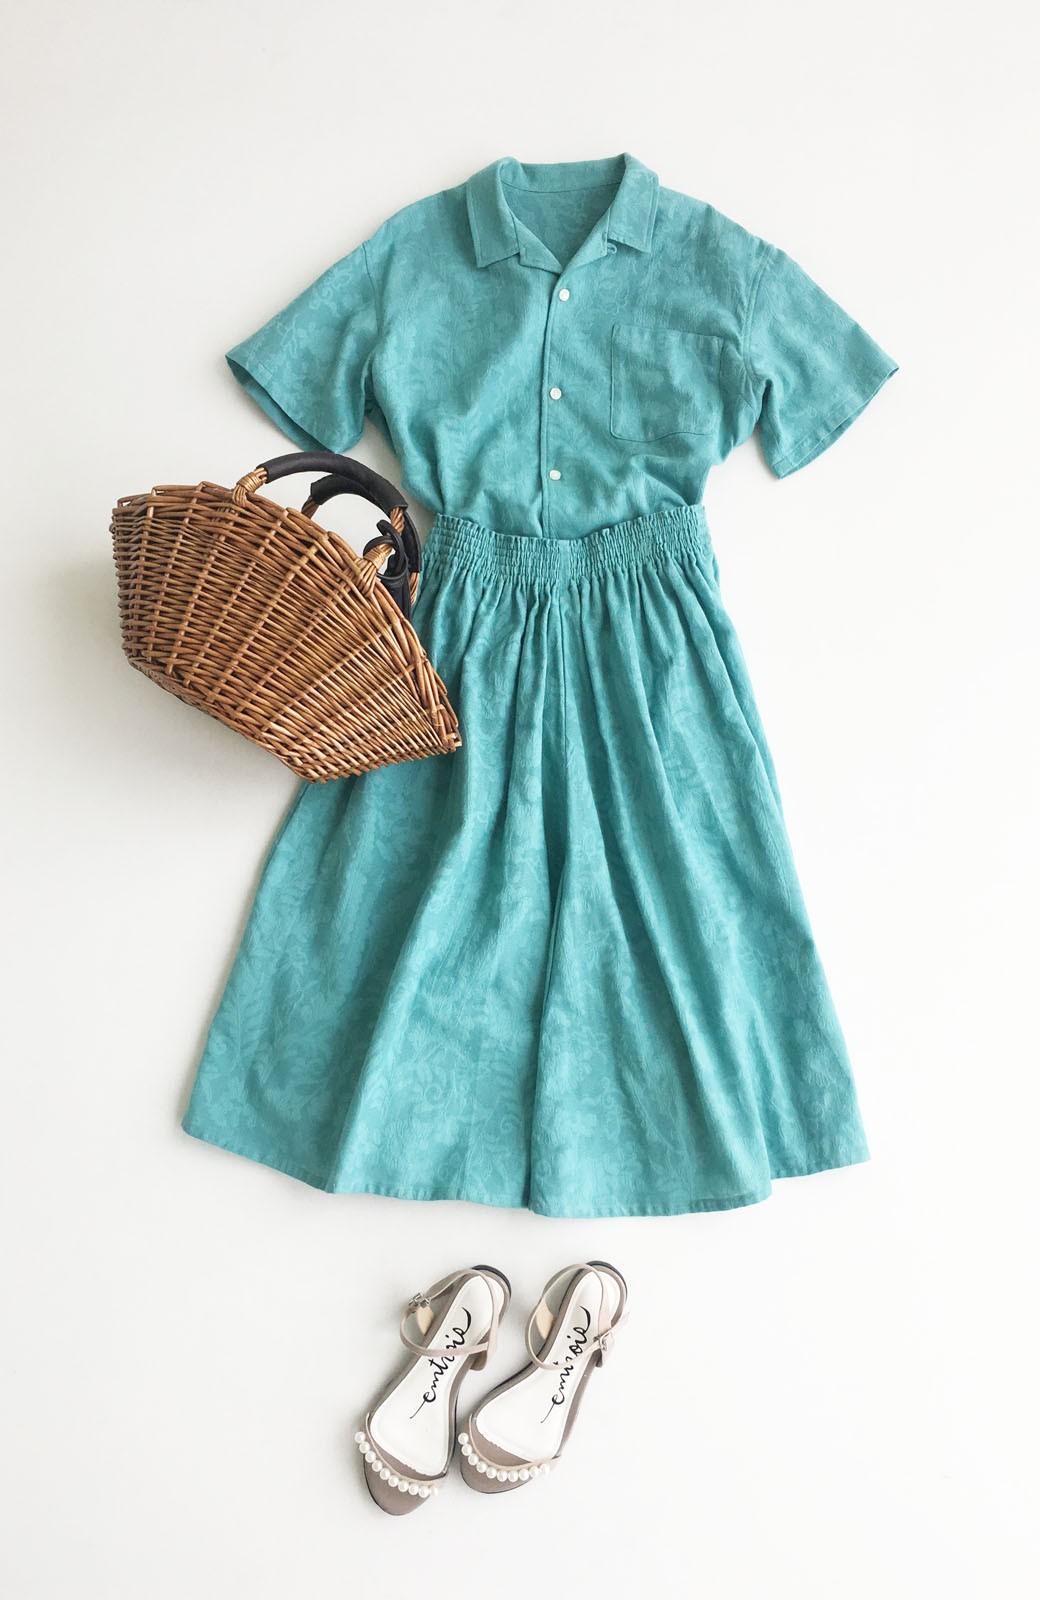 haco! 【今年も再販!】京都の浴衣屋さんと作った浴衣生地のシャツ <グリーン>の商品写真1